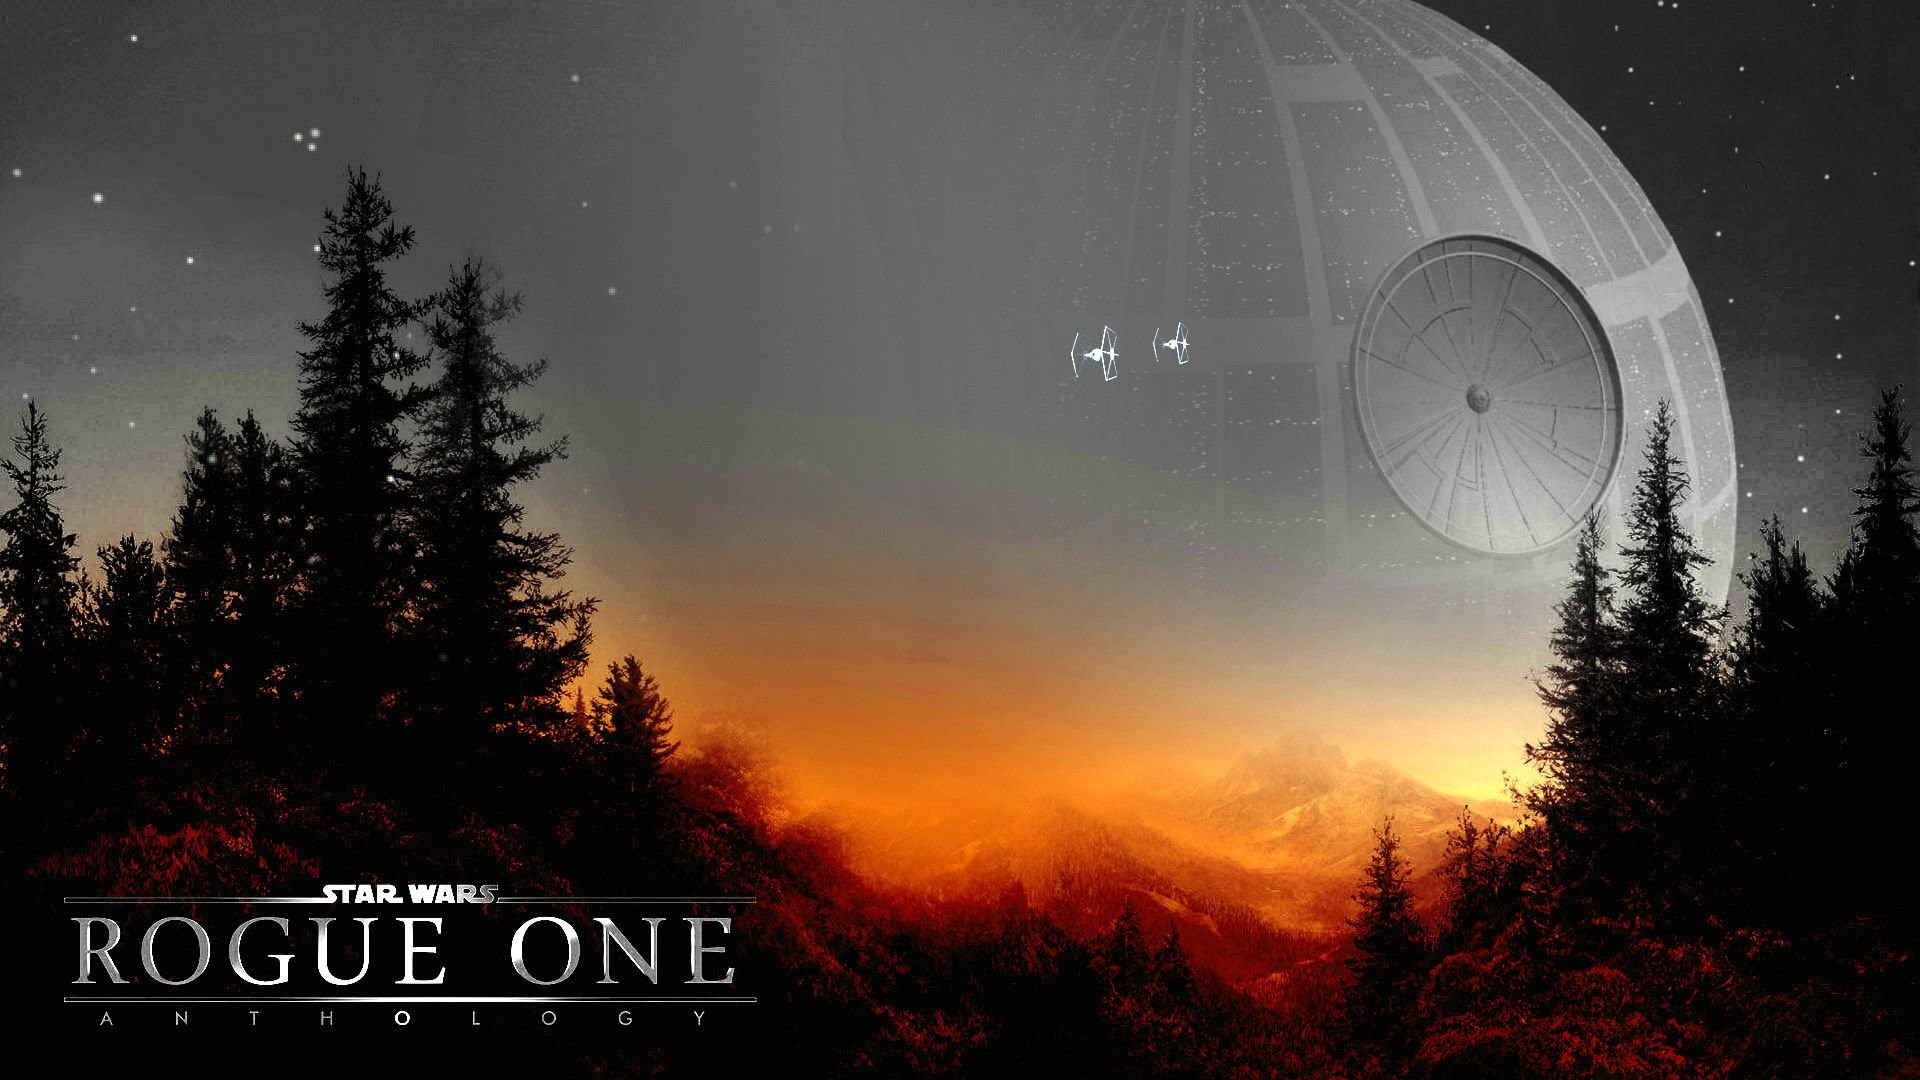 Death Star 4k Wallpaper Posted By John Johnson